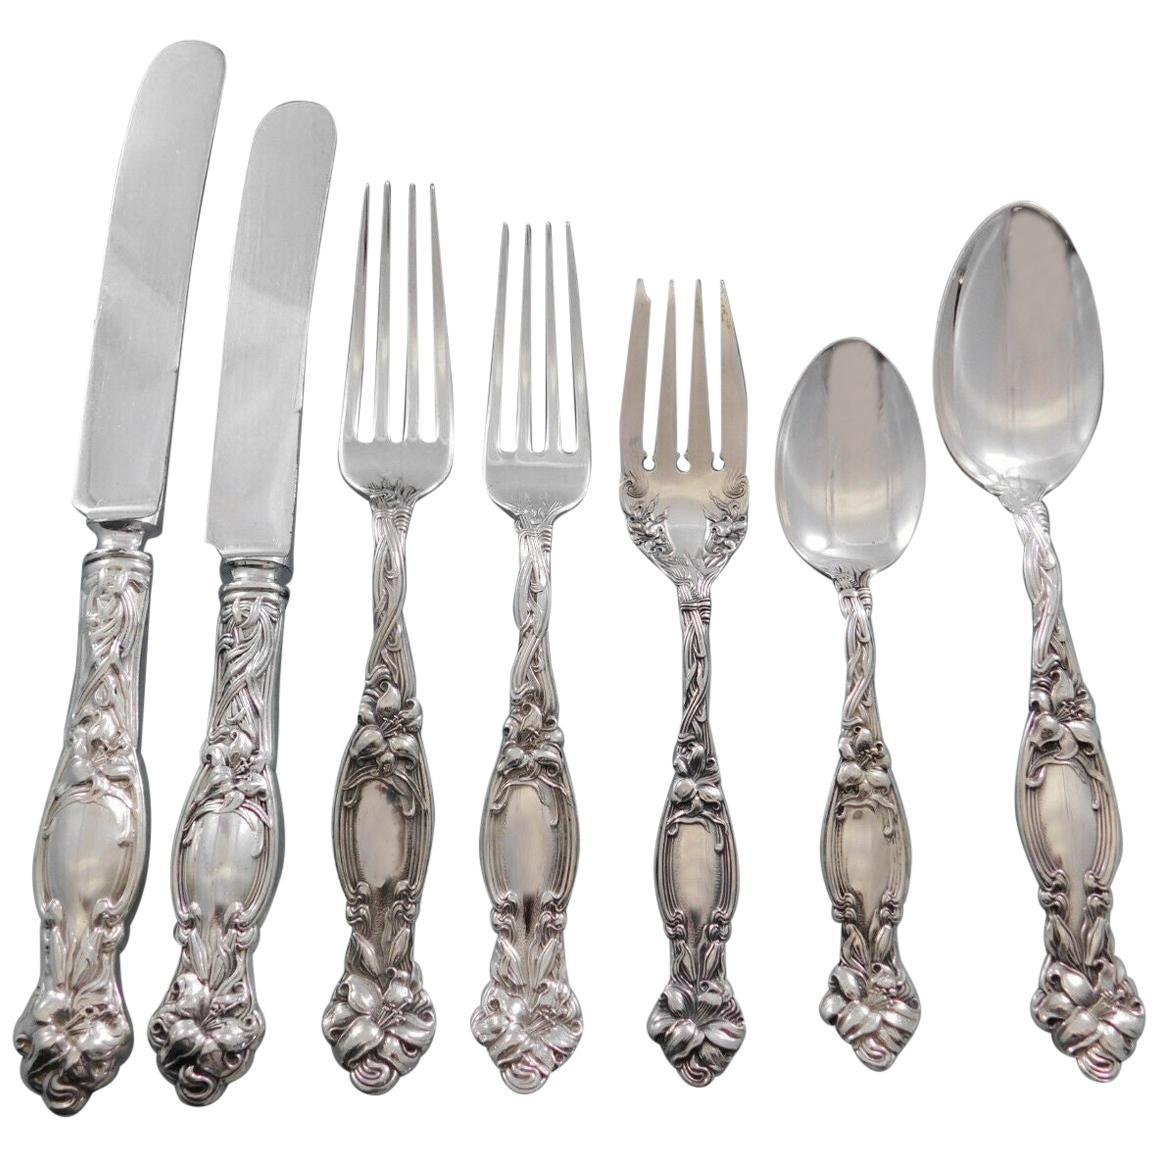 Frontenac by International Sterling Silver Flatware Set 12 Service 89 Pc Dinner